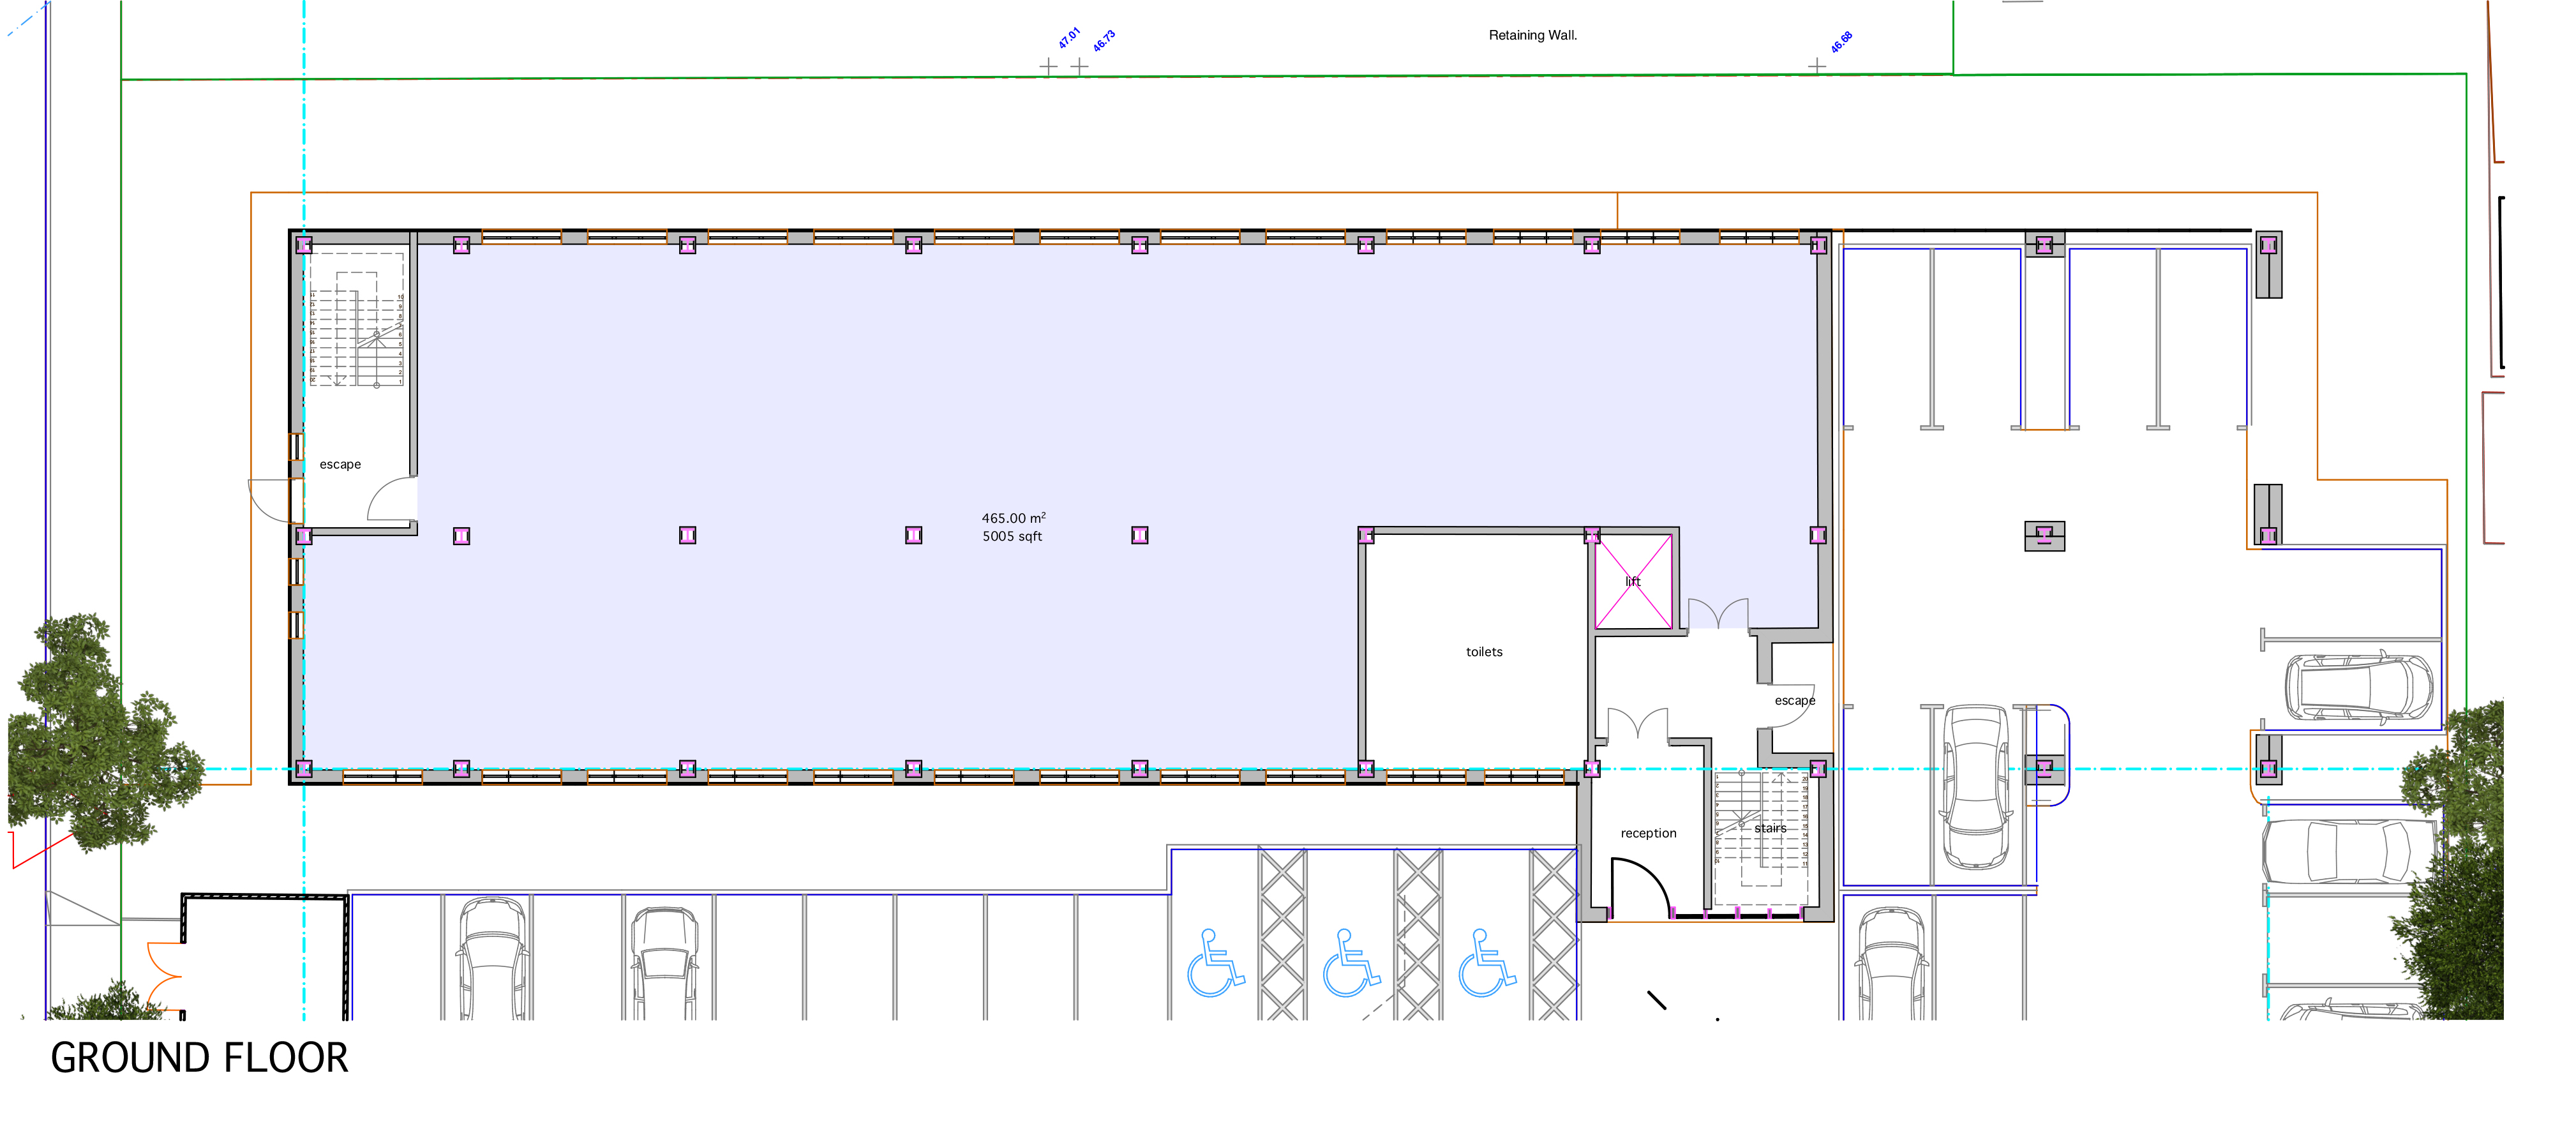 Office Ground Floor Plan